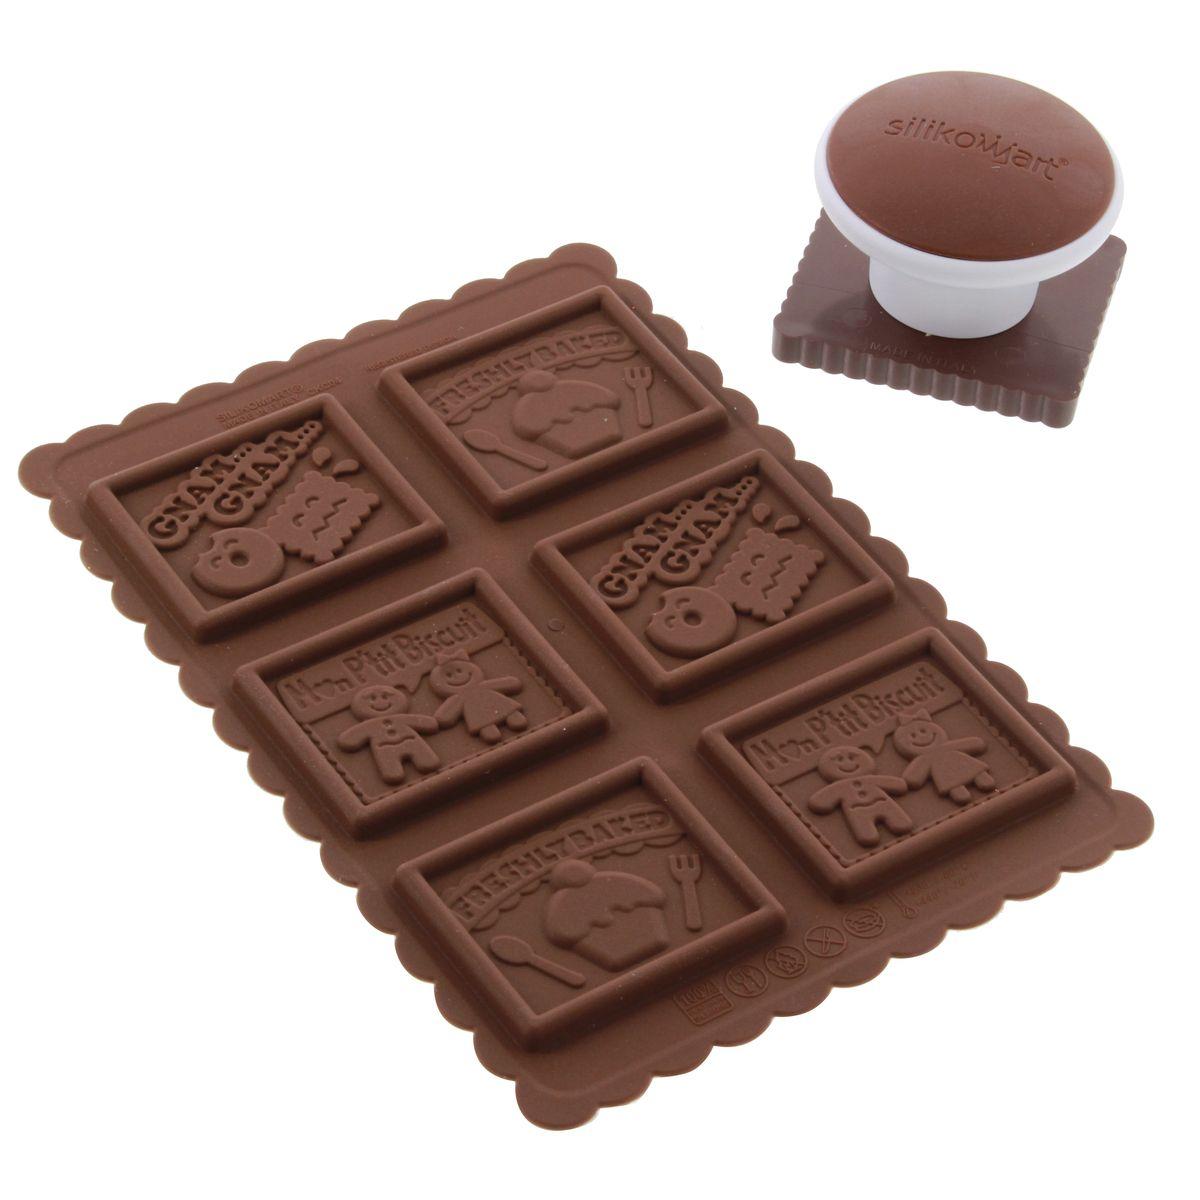 Kit moule à biscuits Gnam Gnam - Silikomart